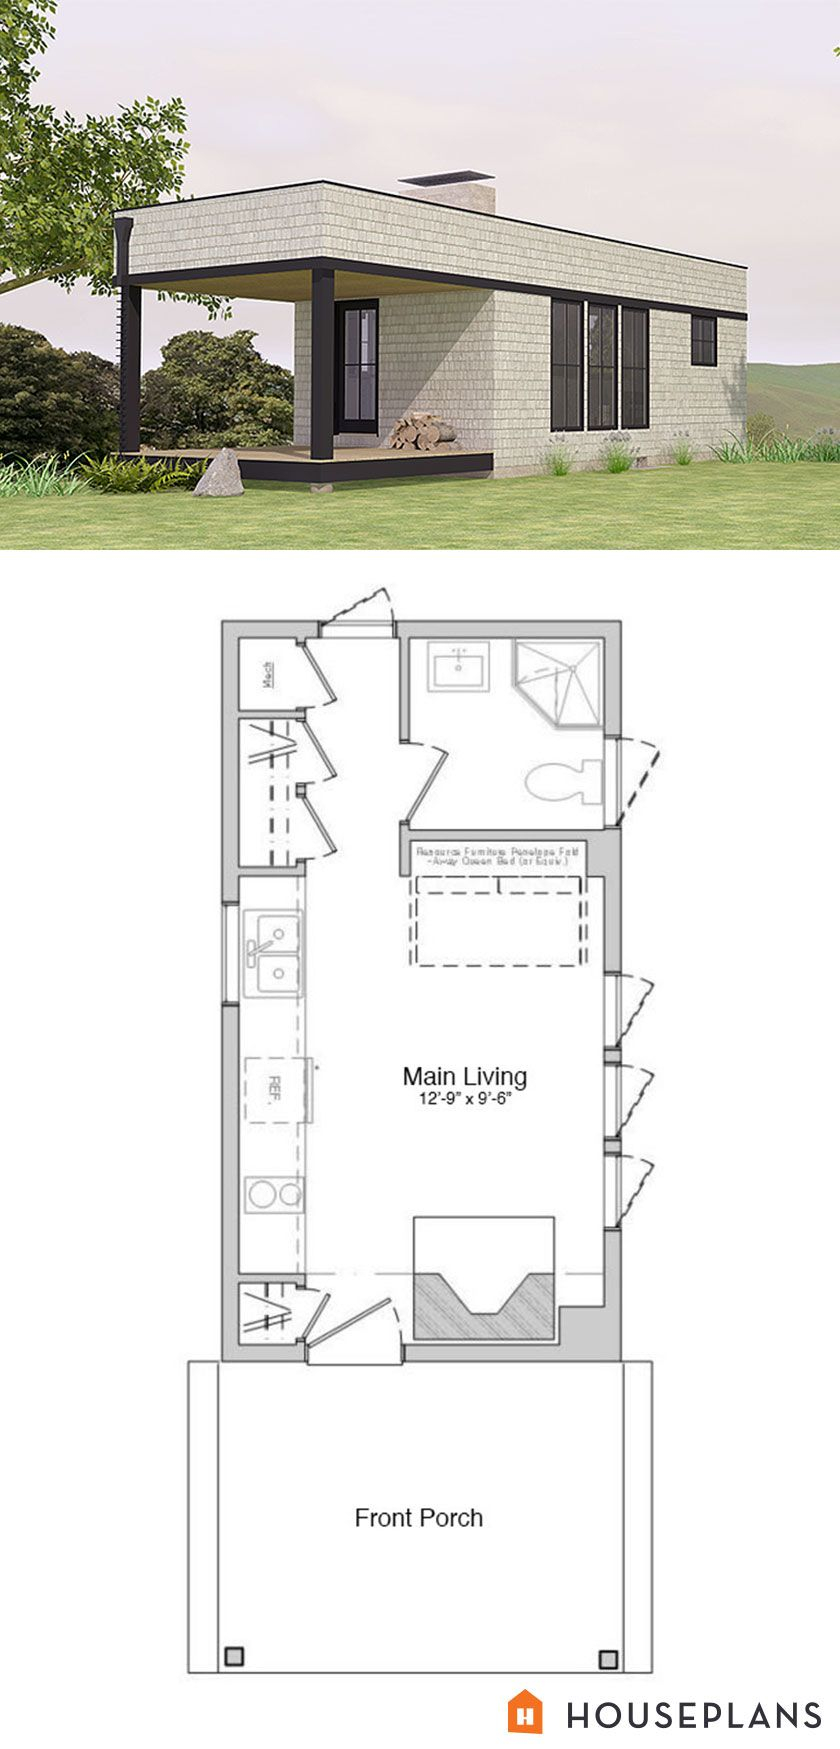 300 sft modern cabin floorplan. 1 bedroom, 1 bathroom ...